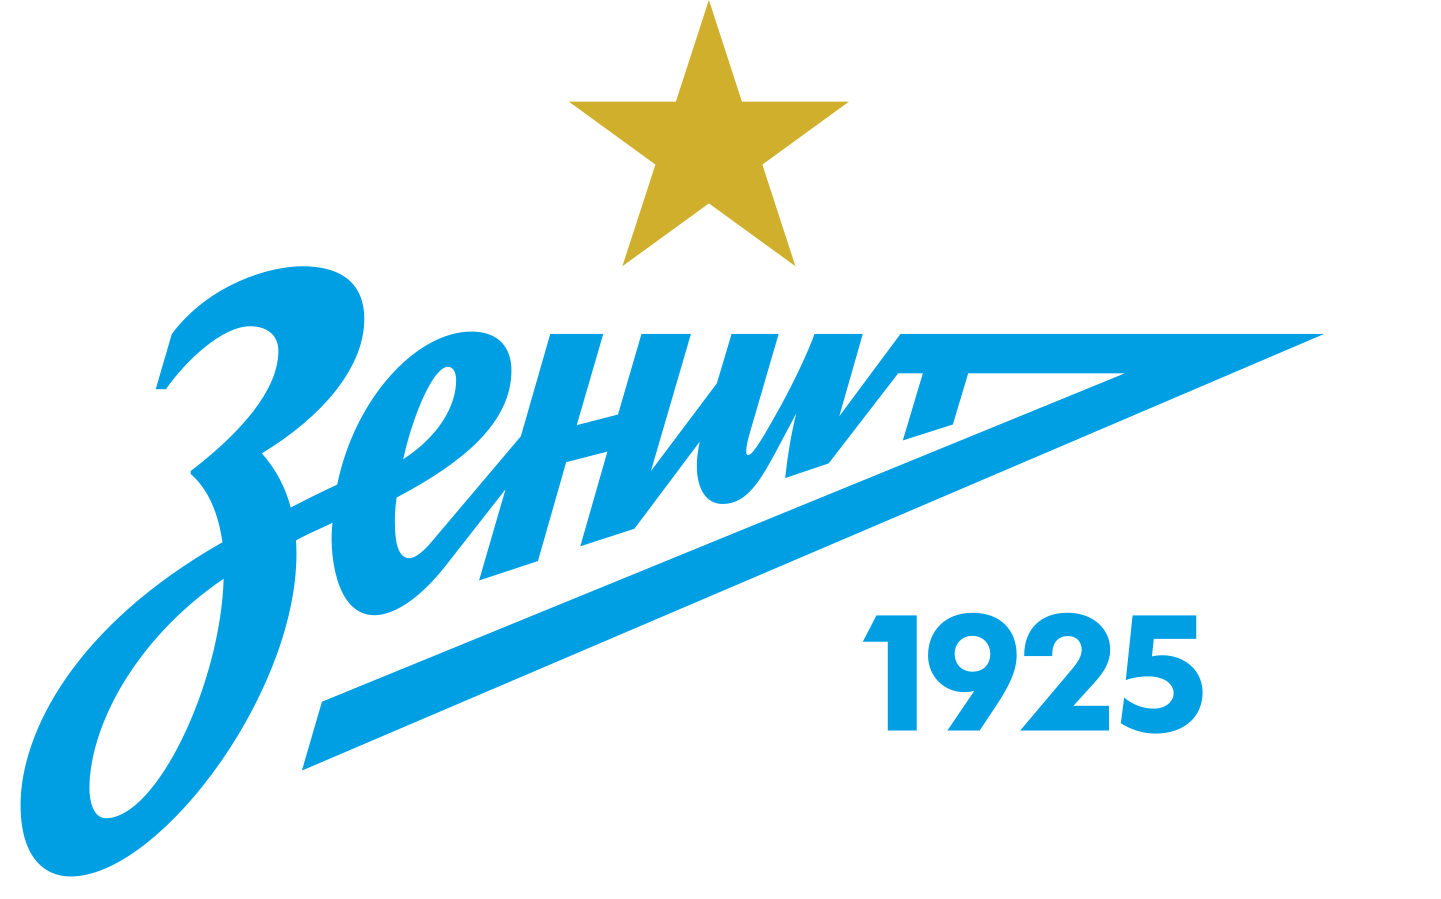 fc zenit logo 2 - FC Zenit Logo - Escudo